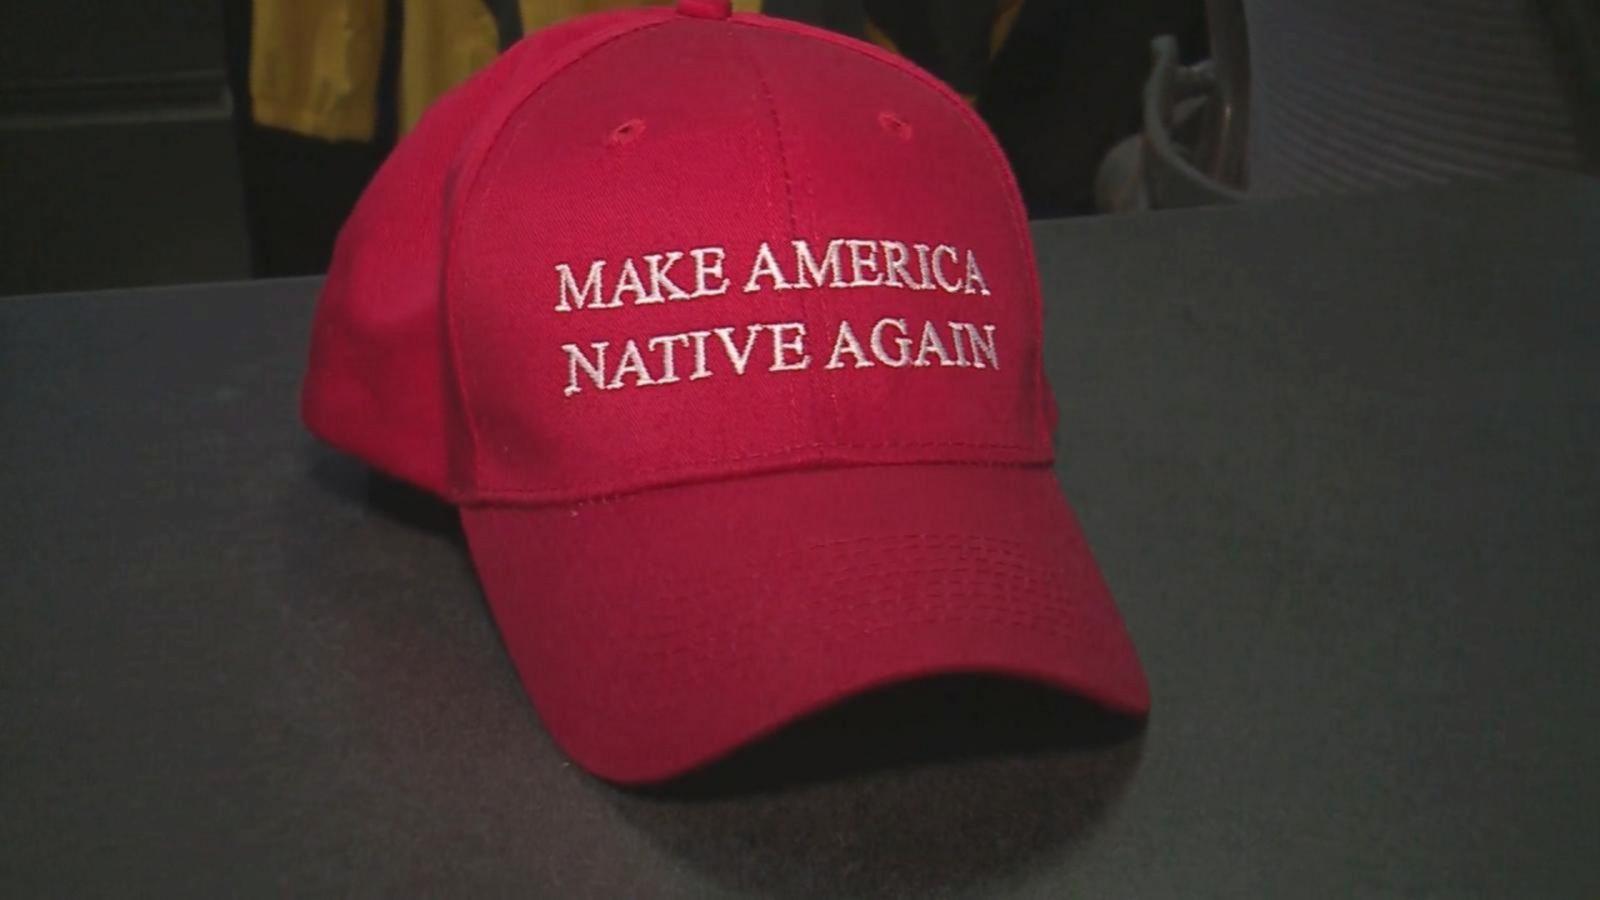 d9f33546ea1 Navajo Artist Creates  Make America Native Again  Hats to Critique ...